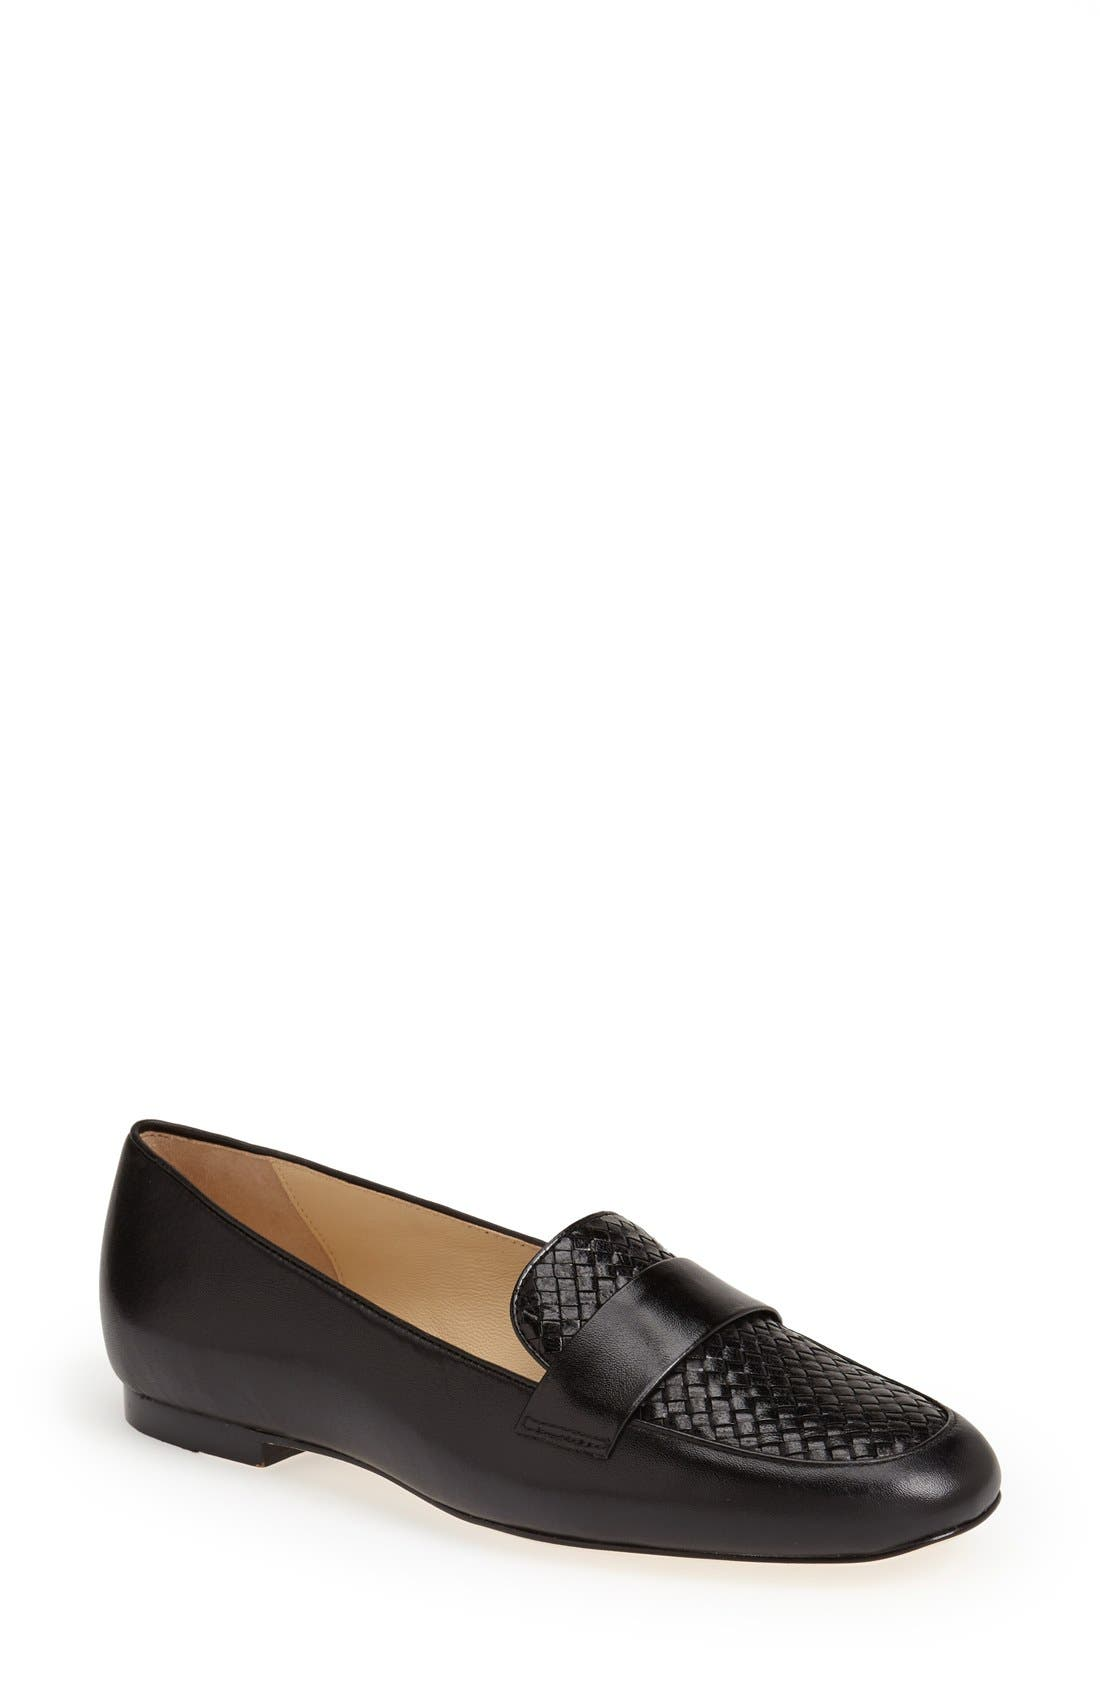 Alternate Image 1 Selected - Cole Haan 'Dakota' Woven Leather Loafer (Women)